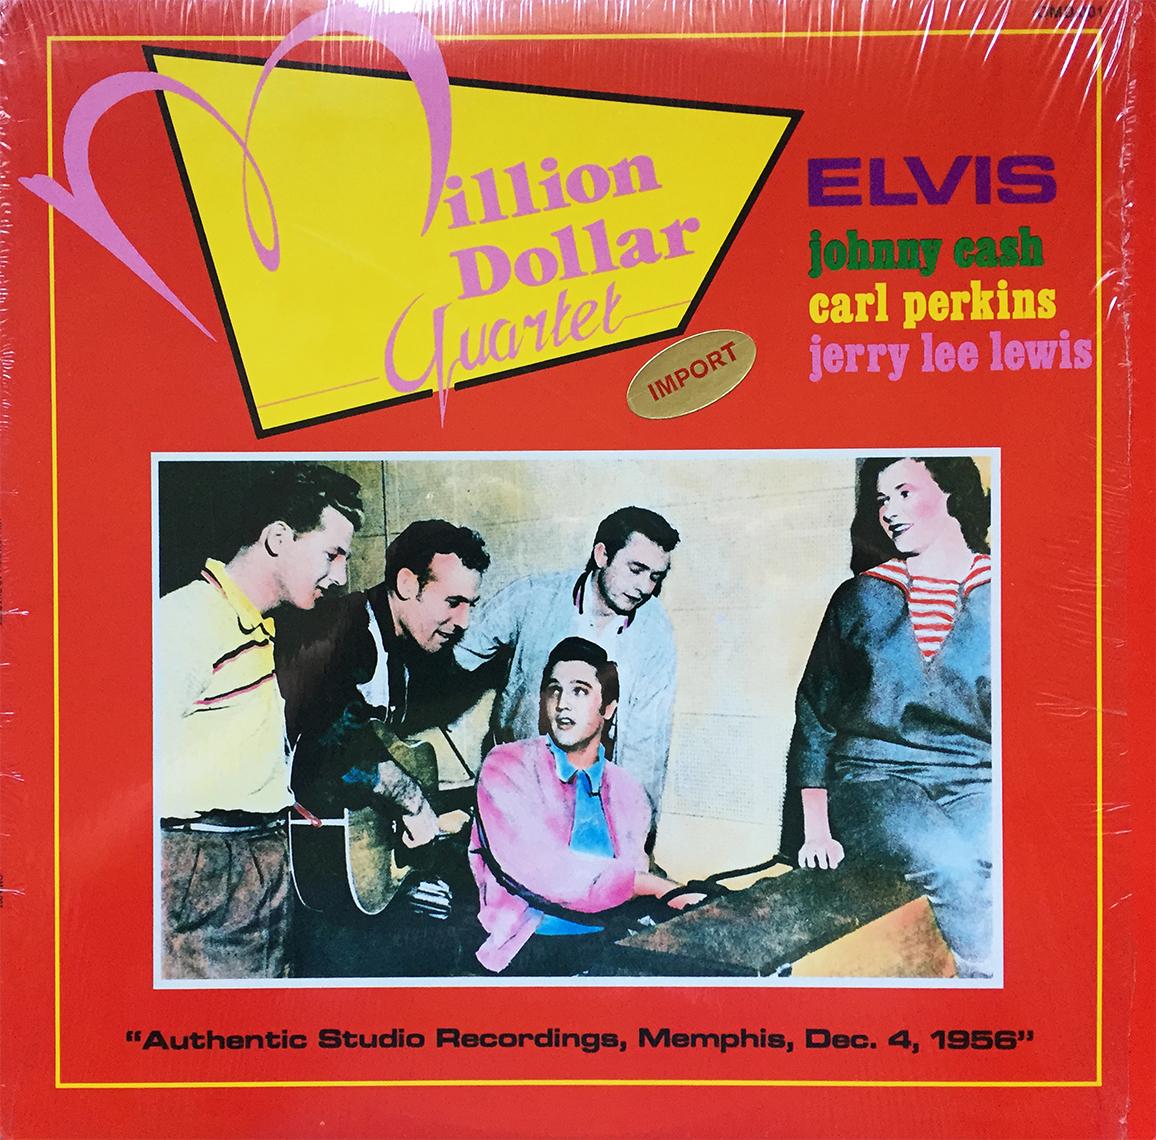 Elvis Presley | The Prudent Groove